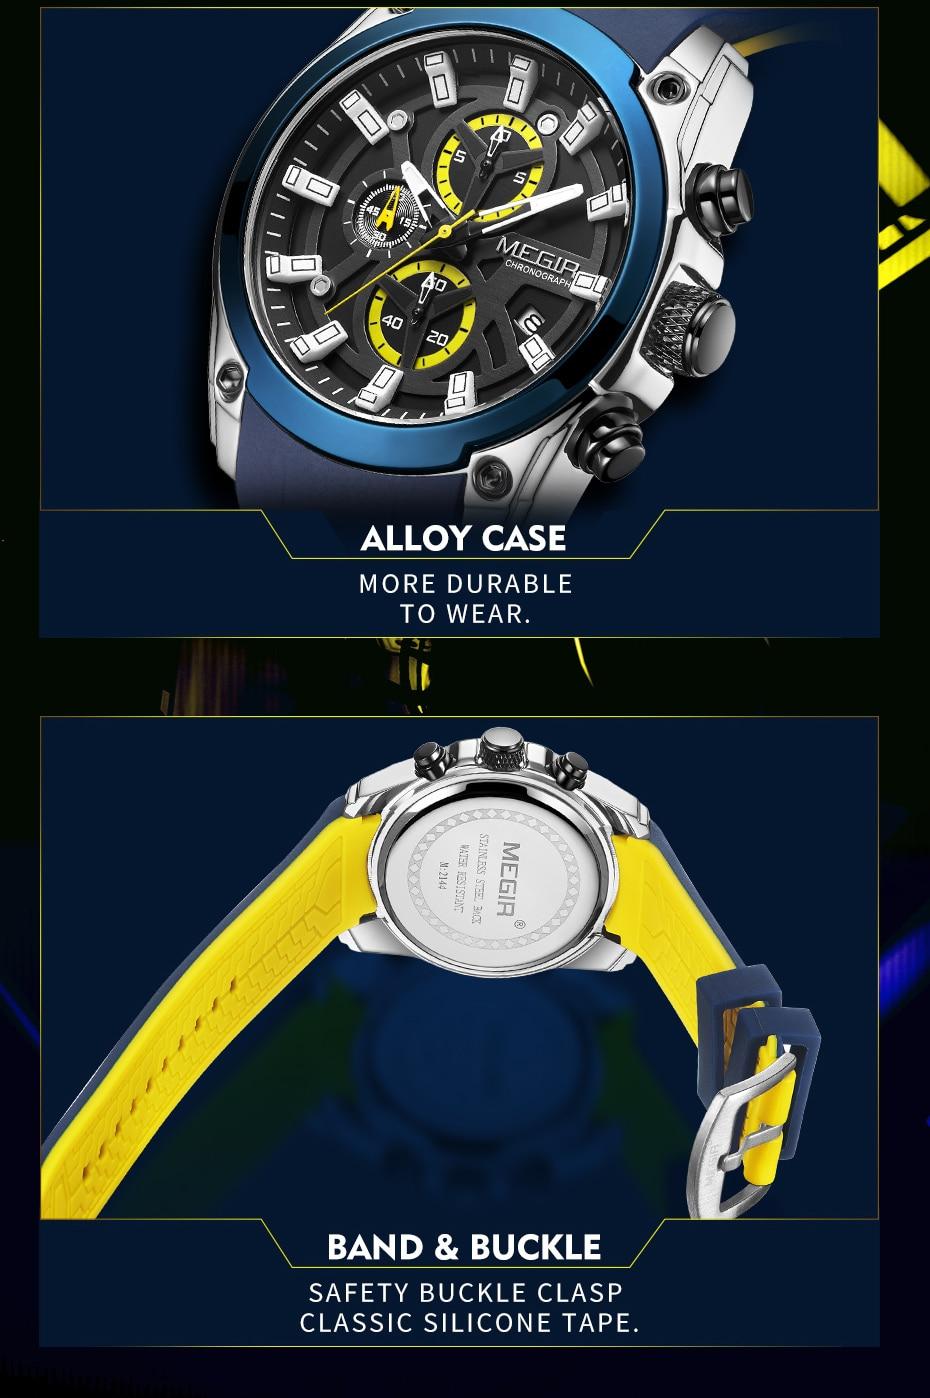 H796328bd36224fed94462ca832b3985aD MEGIR 2020 Blue Sport Watches for Men